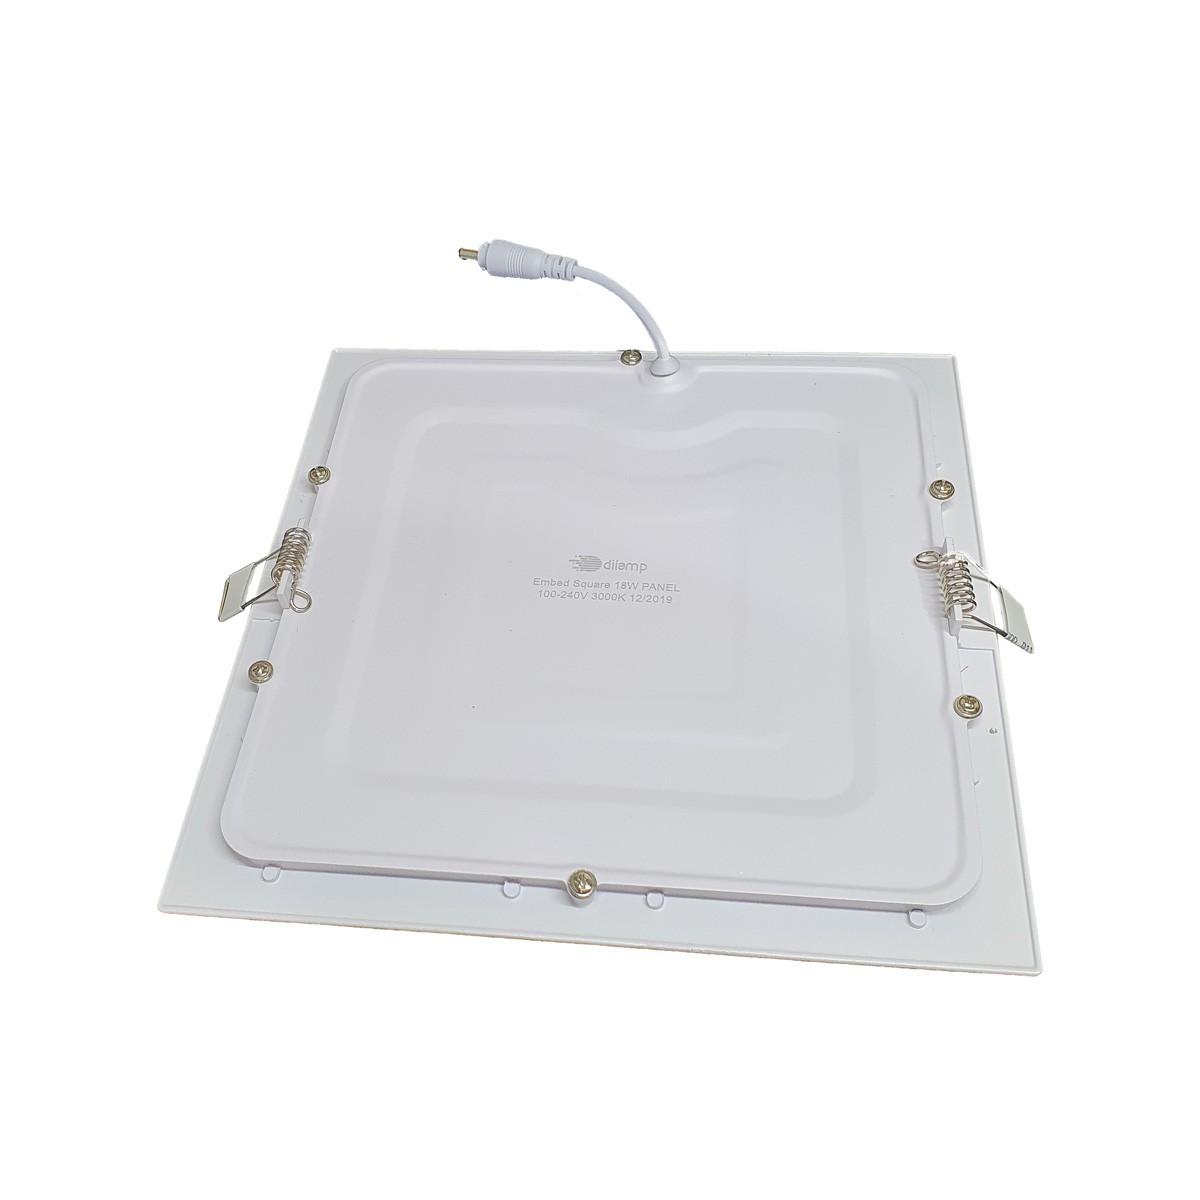 KIT 5 Painel Plafon LED 18W Quadrado Luz Branca Quente de Embutir